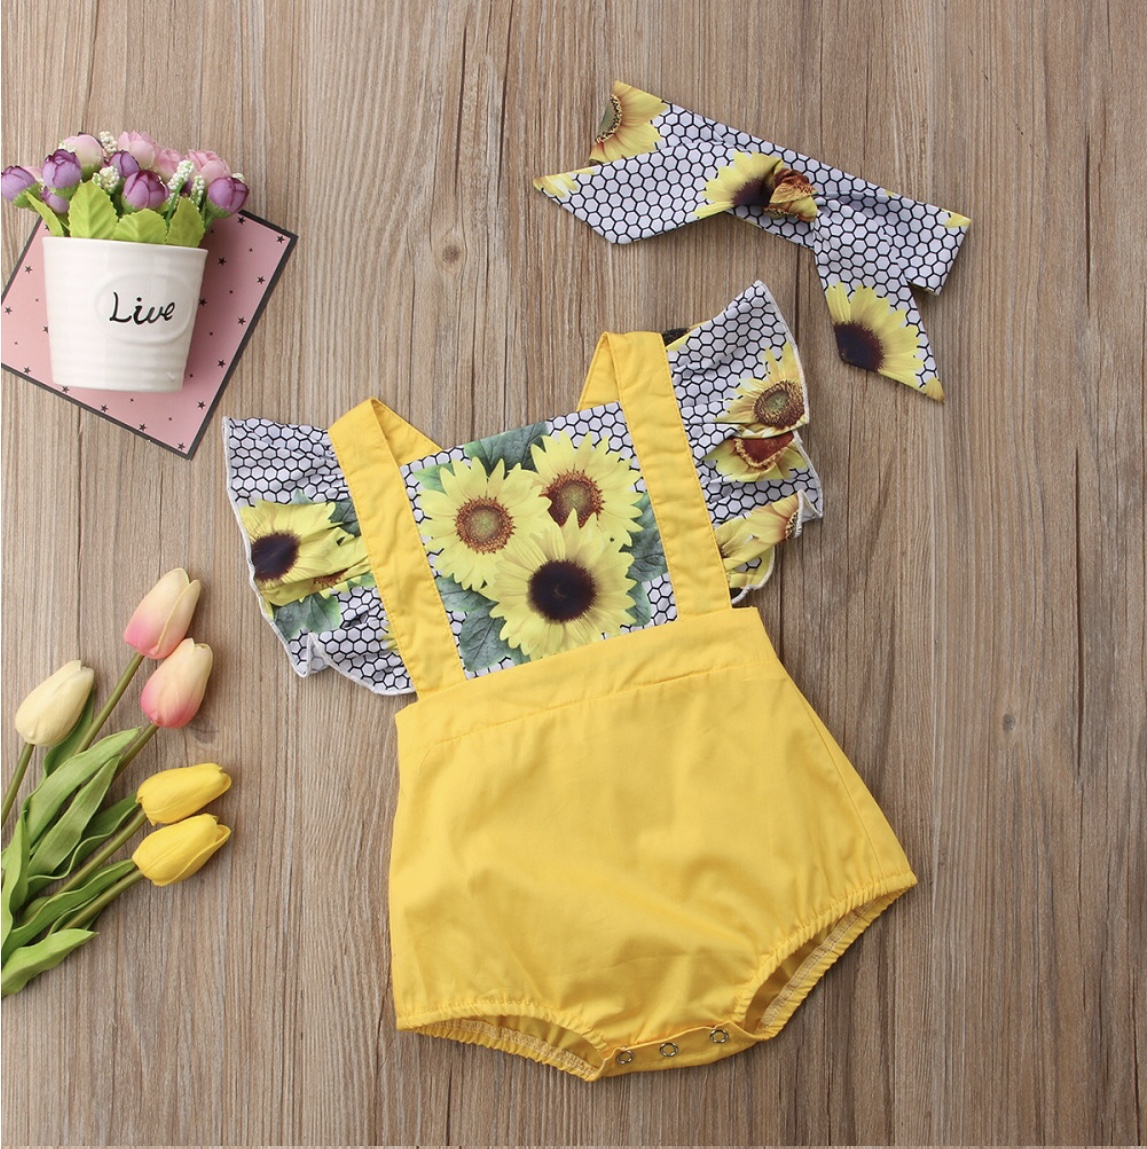 9a4fc5ece19 Sunflower Bliss Romper · Isabella Iris Boutique · Online Store ...